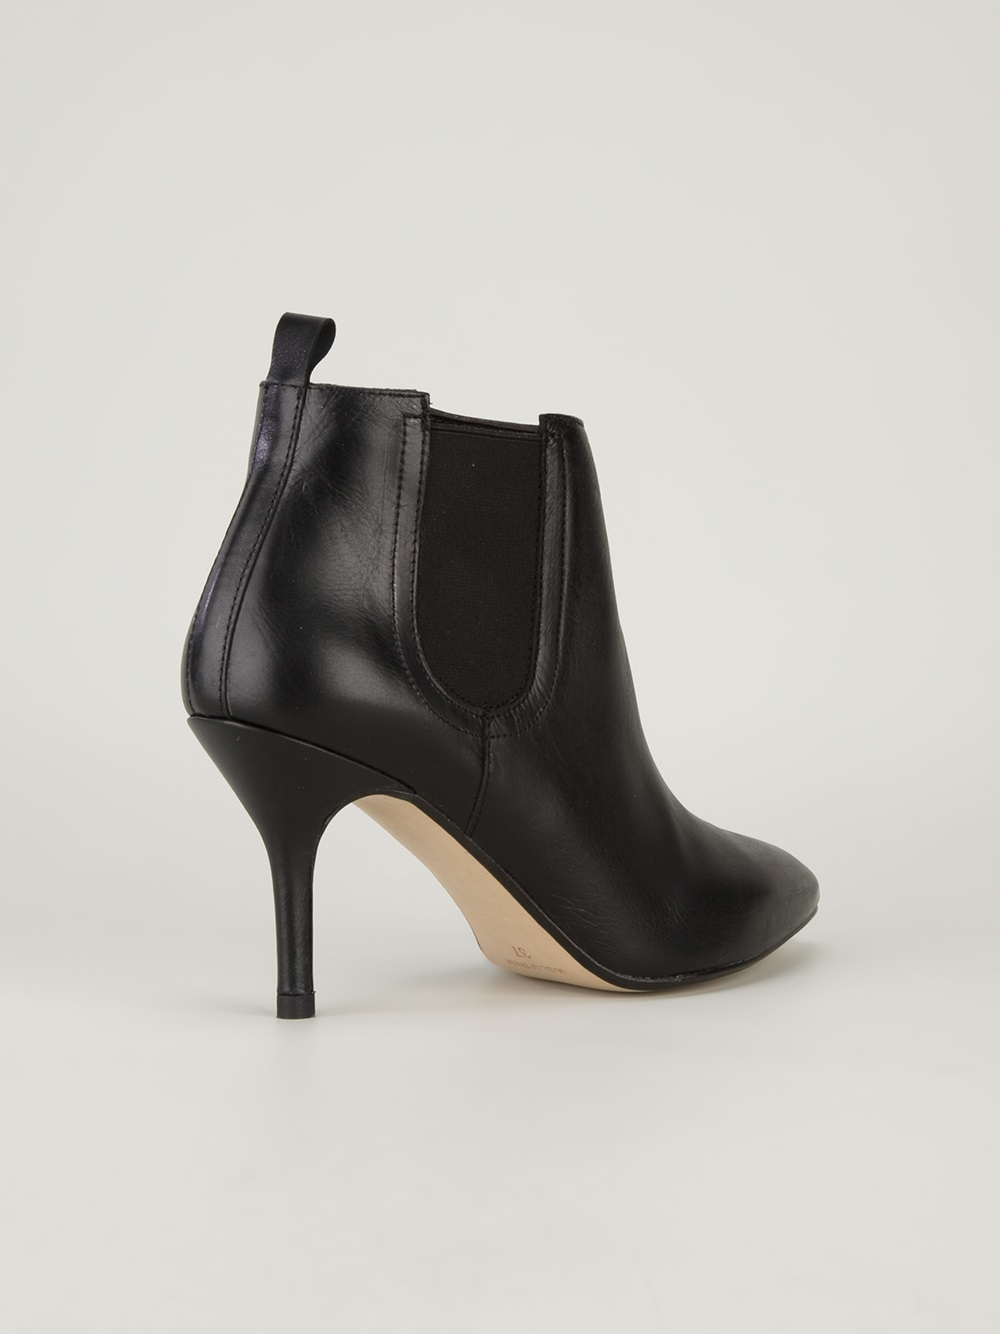 Gardenia Stiletto Ankle Boot in Black   Lyst